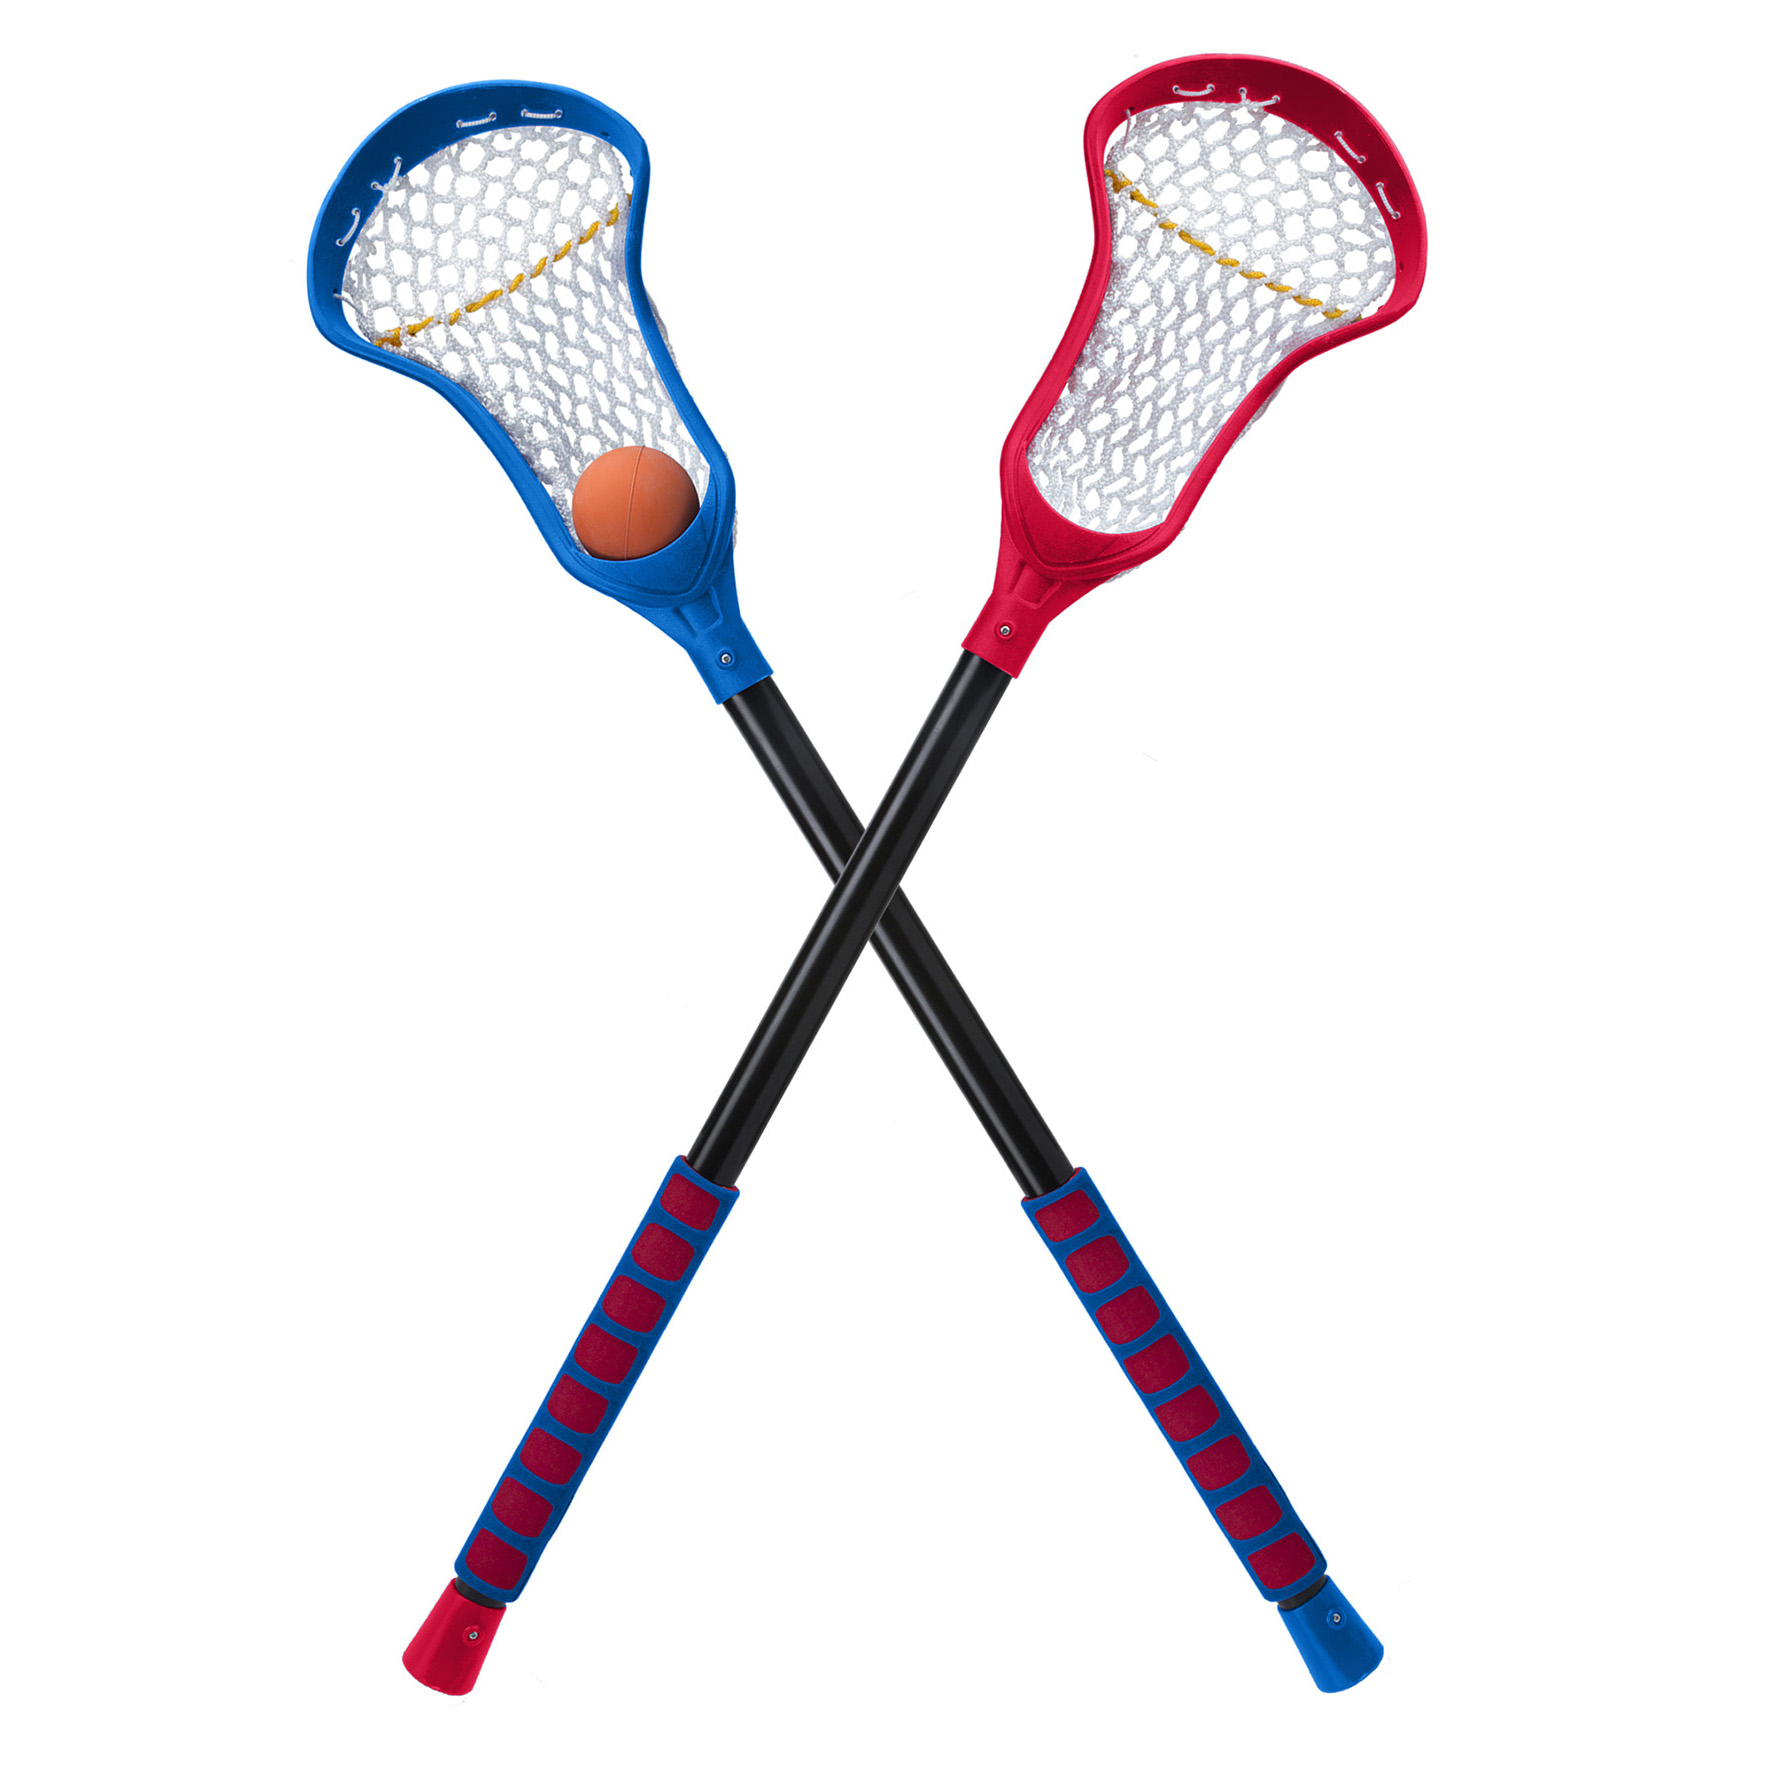 1767x1767 Lacrosse Stick Clip Art Chadholtz